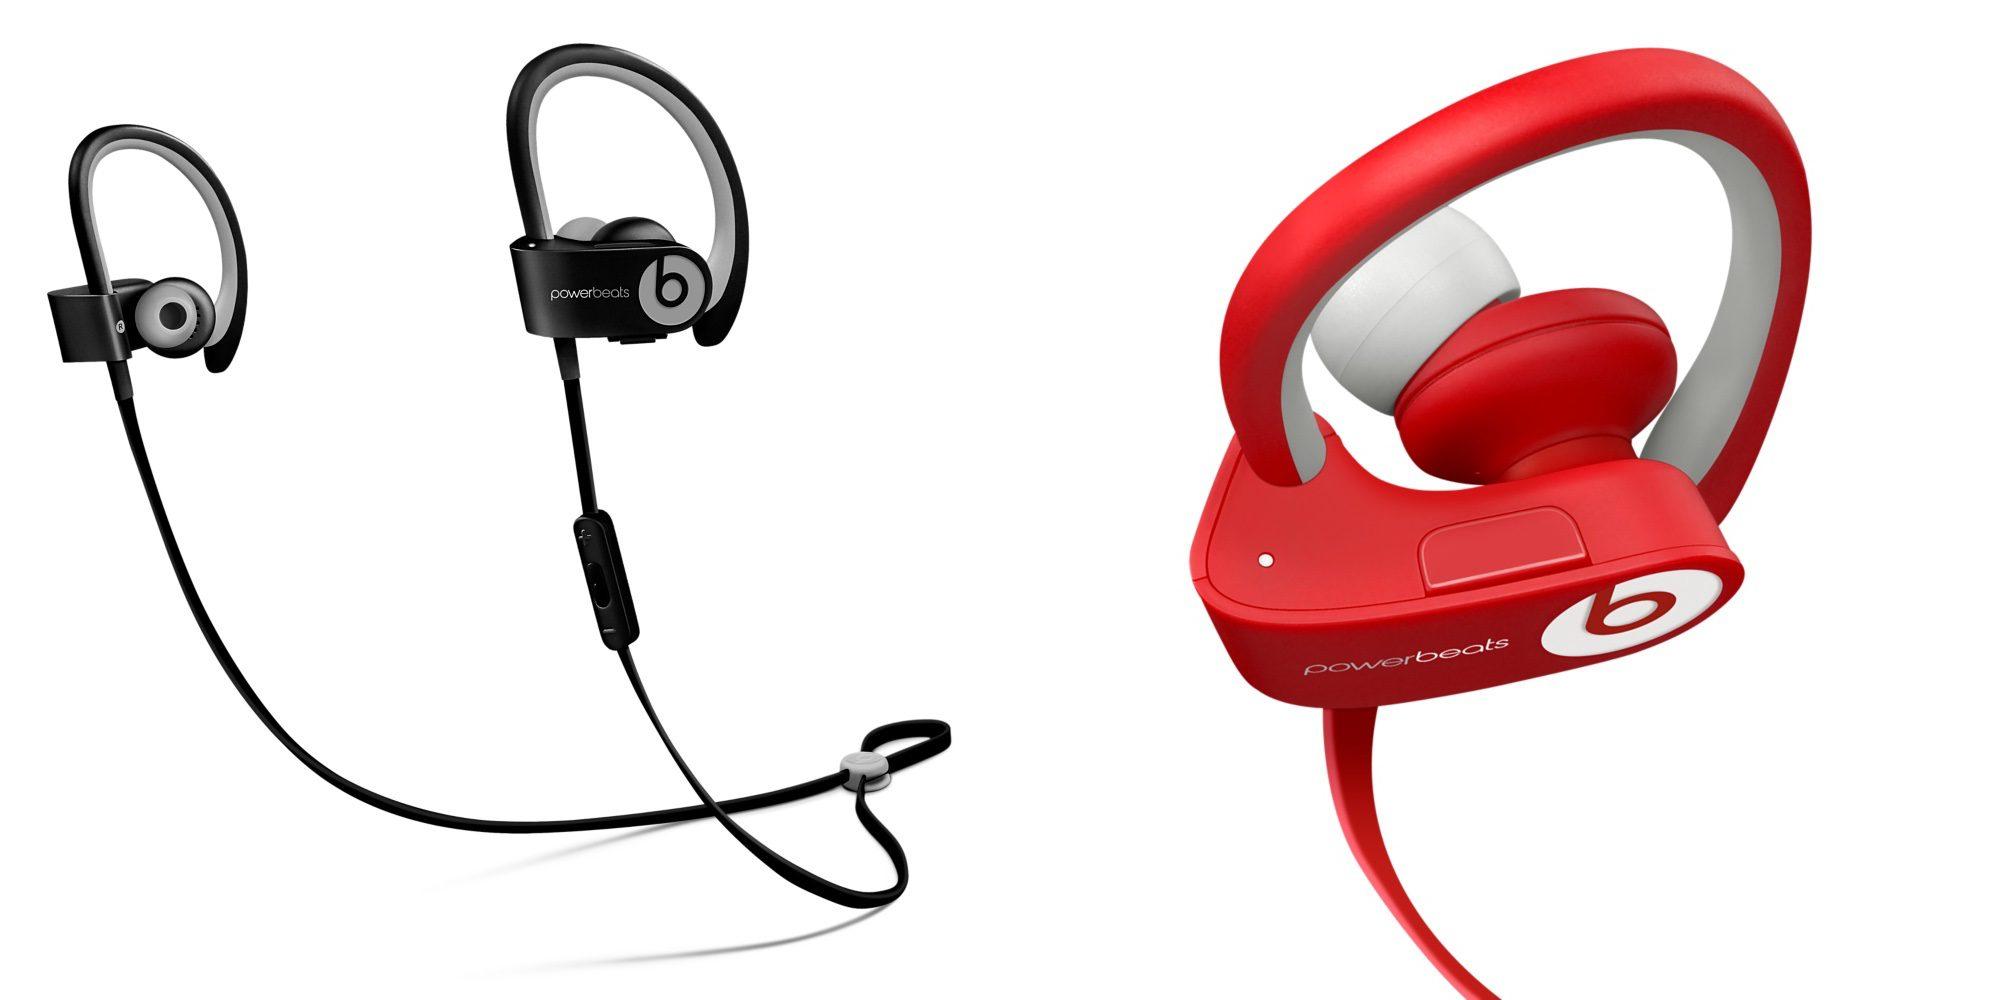 Iphone 7 earphones - headphone iphone 7 apple